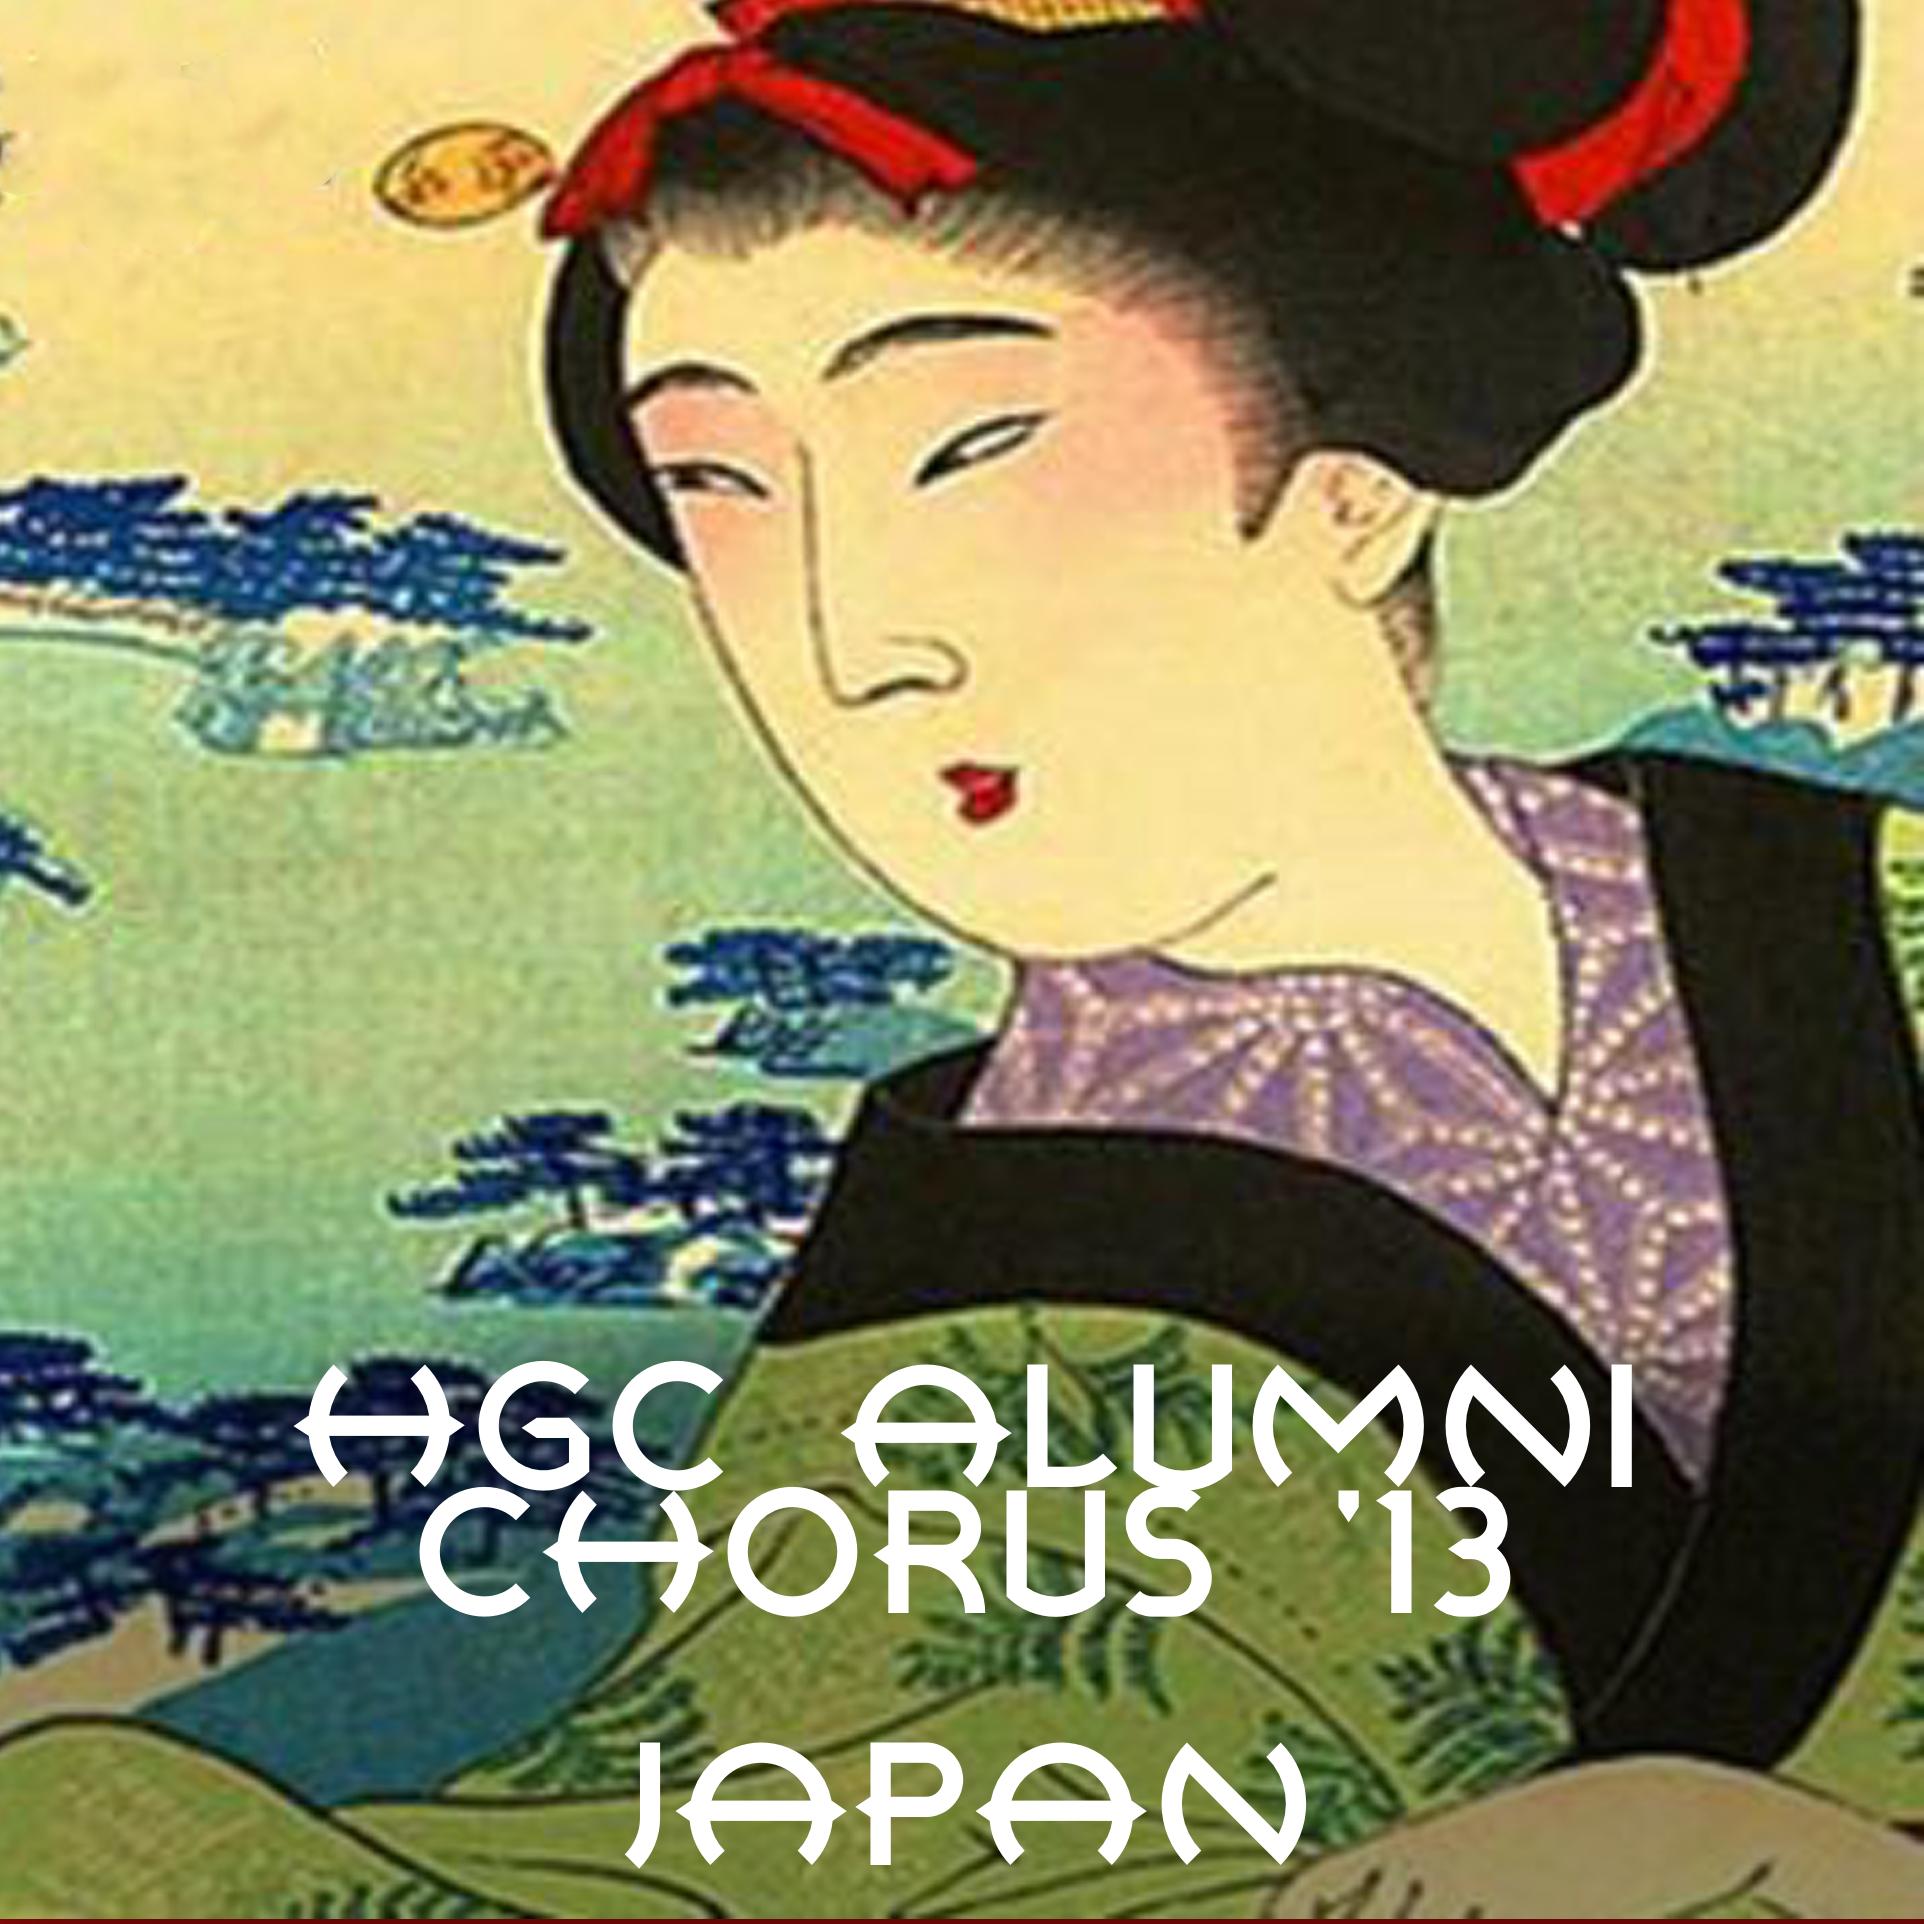 JAPAN ICON.jpg